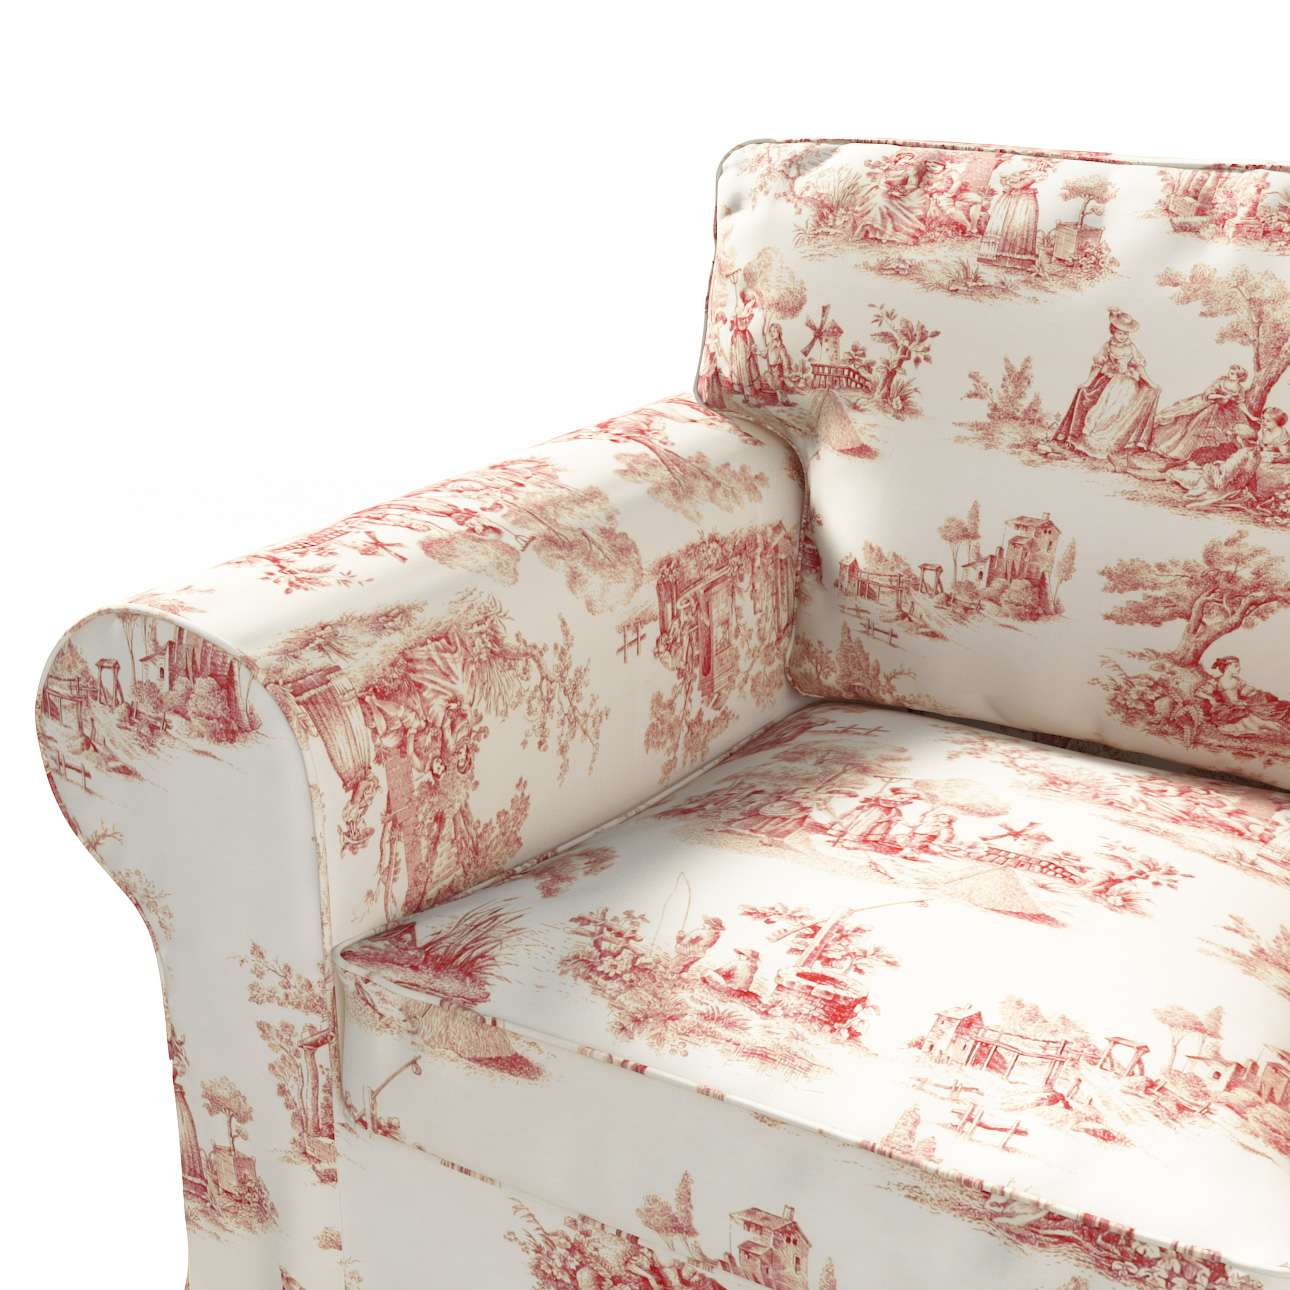 Ektorp Sesselbezug Sesselhusse, Ektorp Sessel von der Kollektion Avinon, Stoff: 132-15